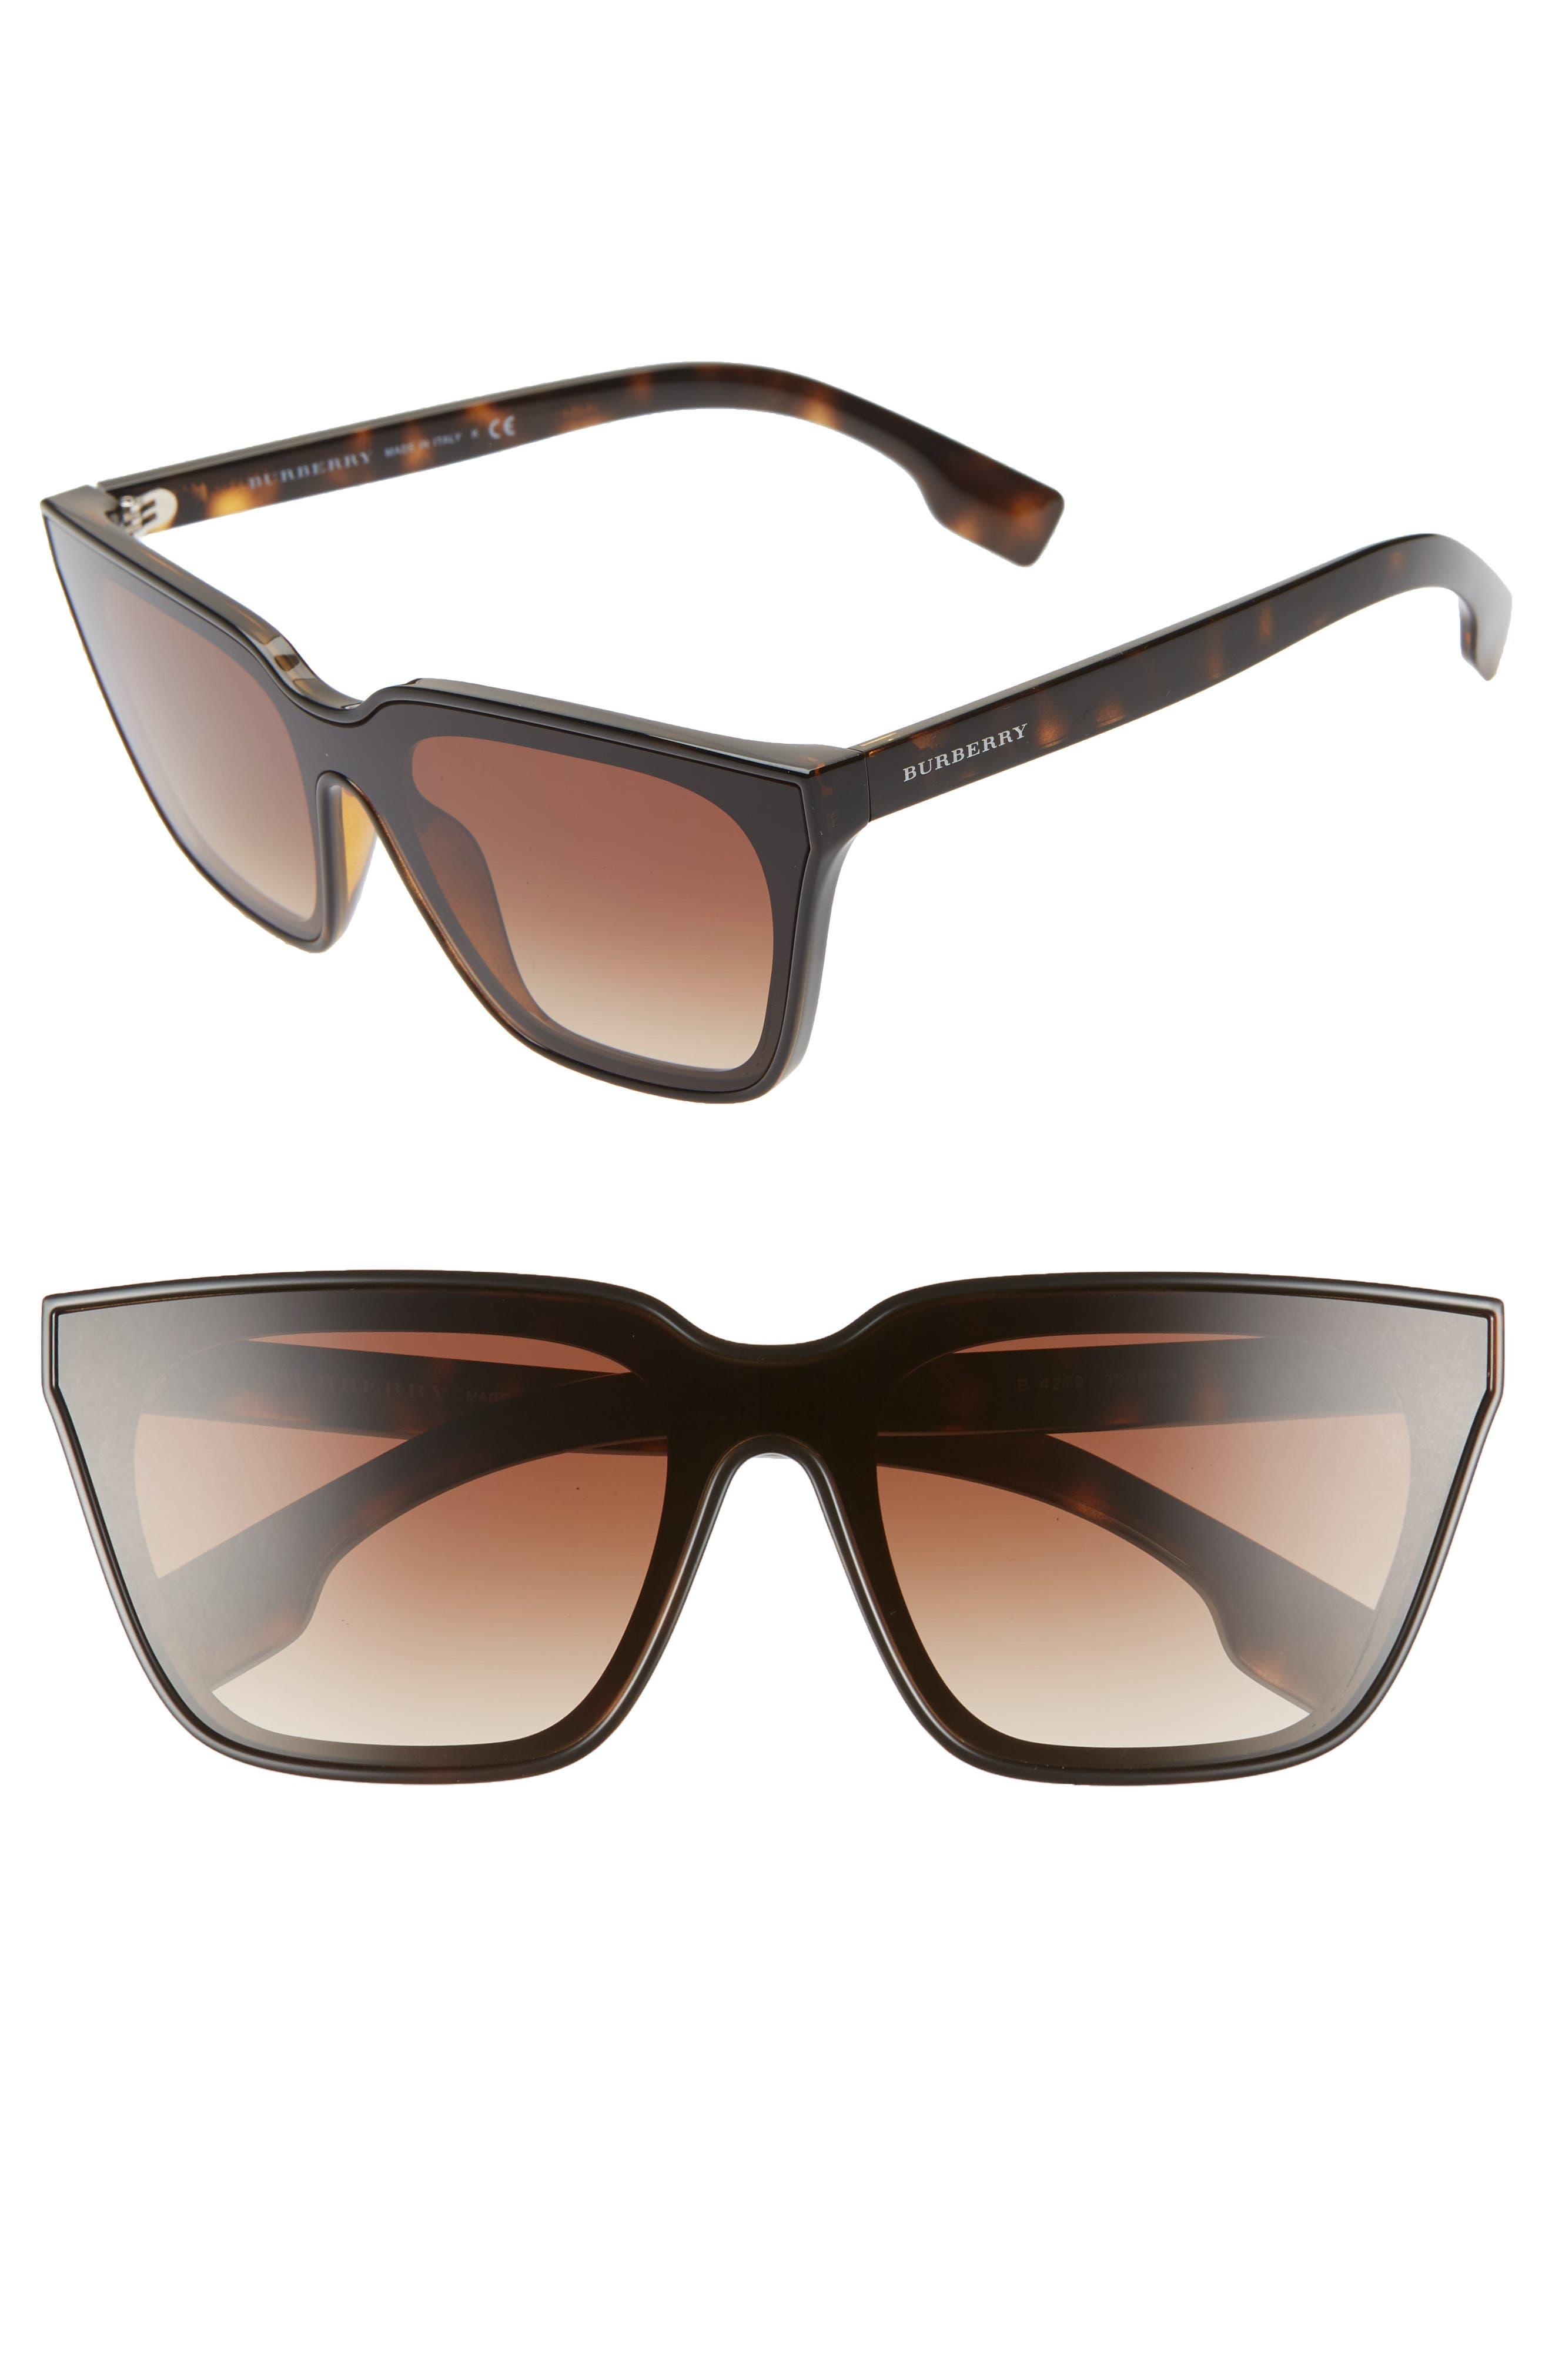 BURBERRY, 40mm Square Sunglasses, Main thumbnail 1, color, BLACK/ DARK HAVANA GRADIENT